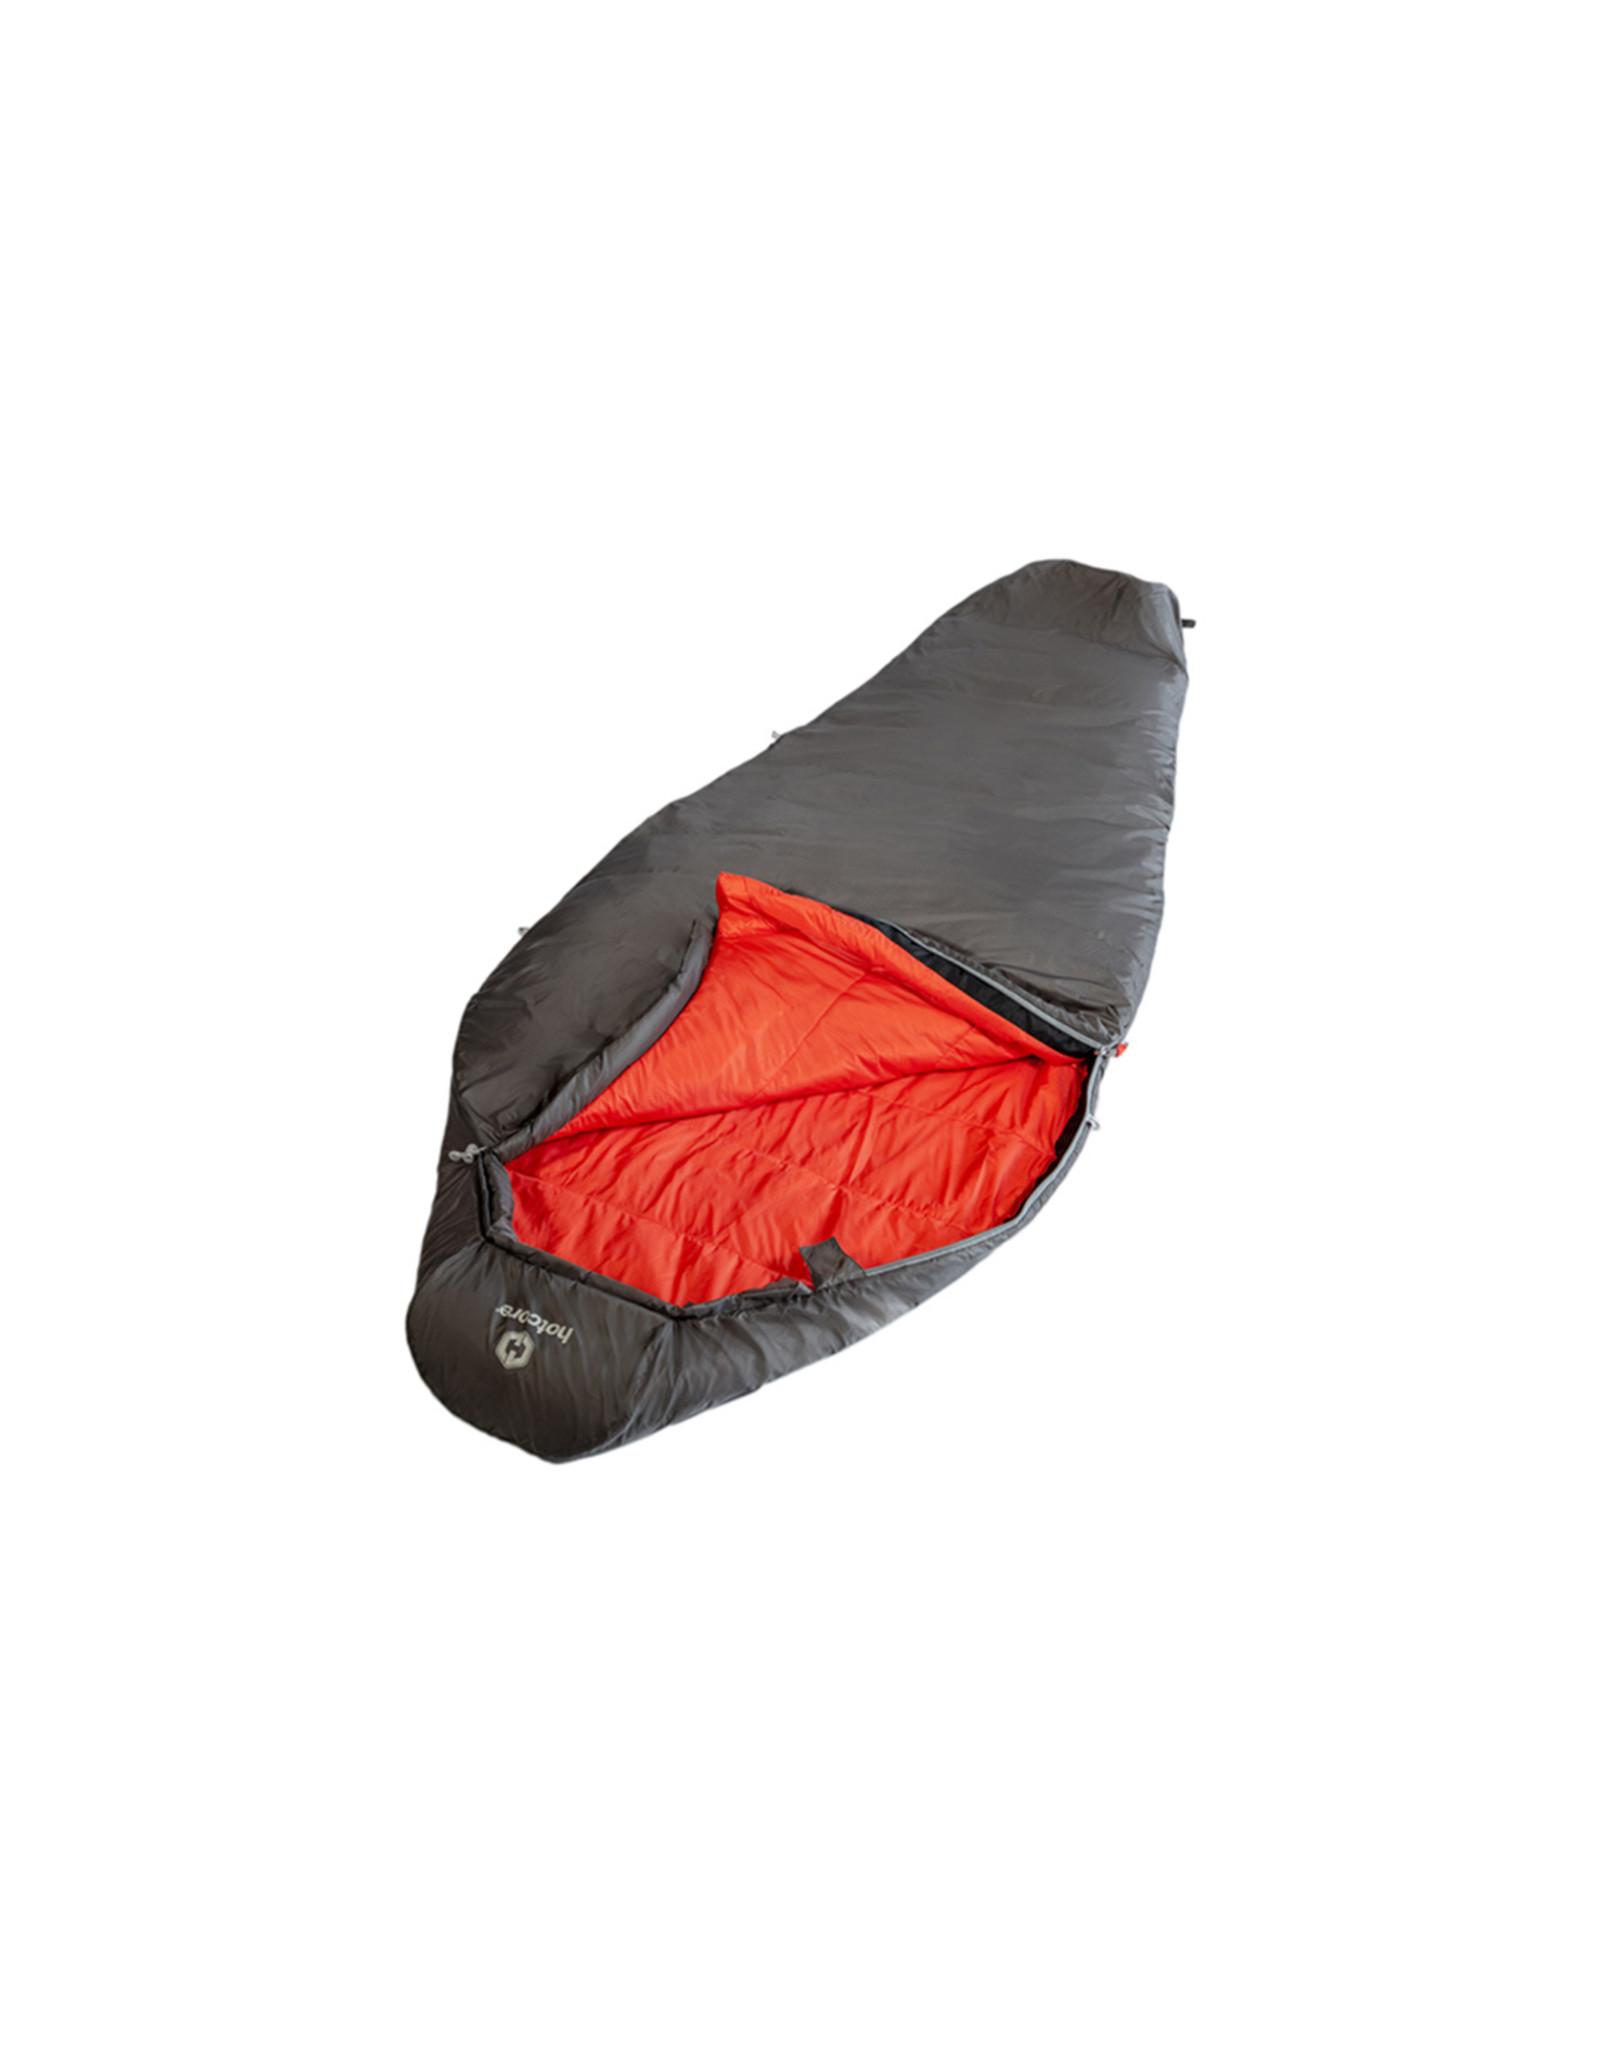 HOTCORE NIRVANA 100 SLEEPING BAG